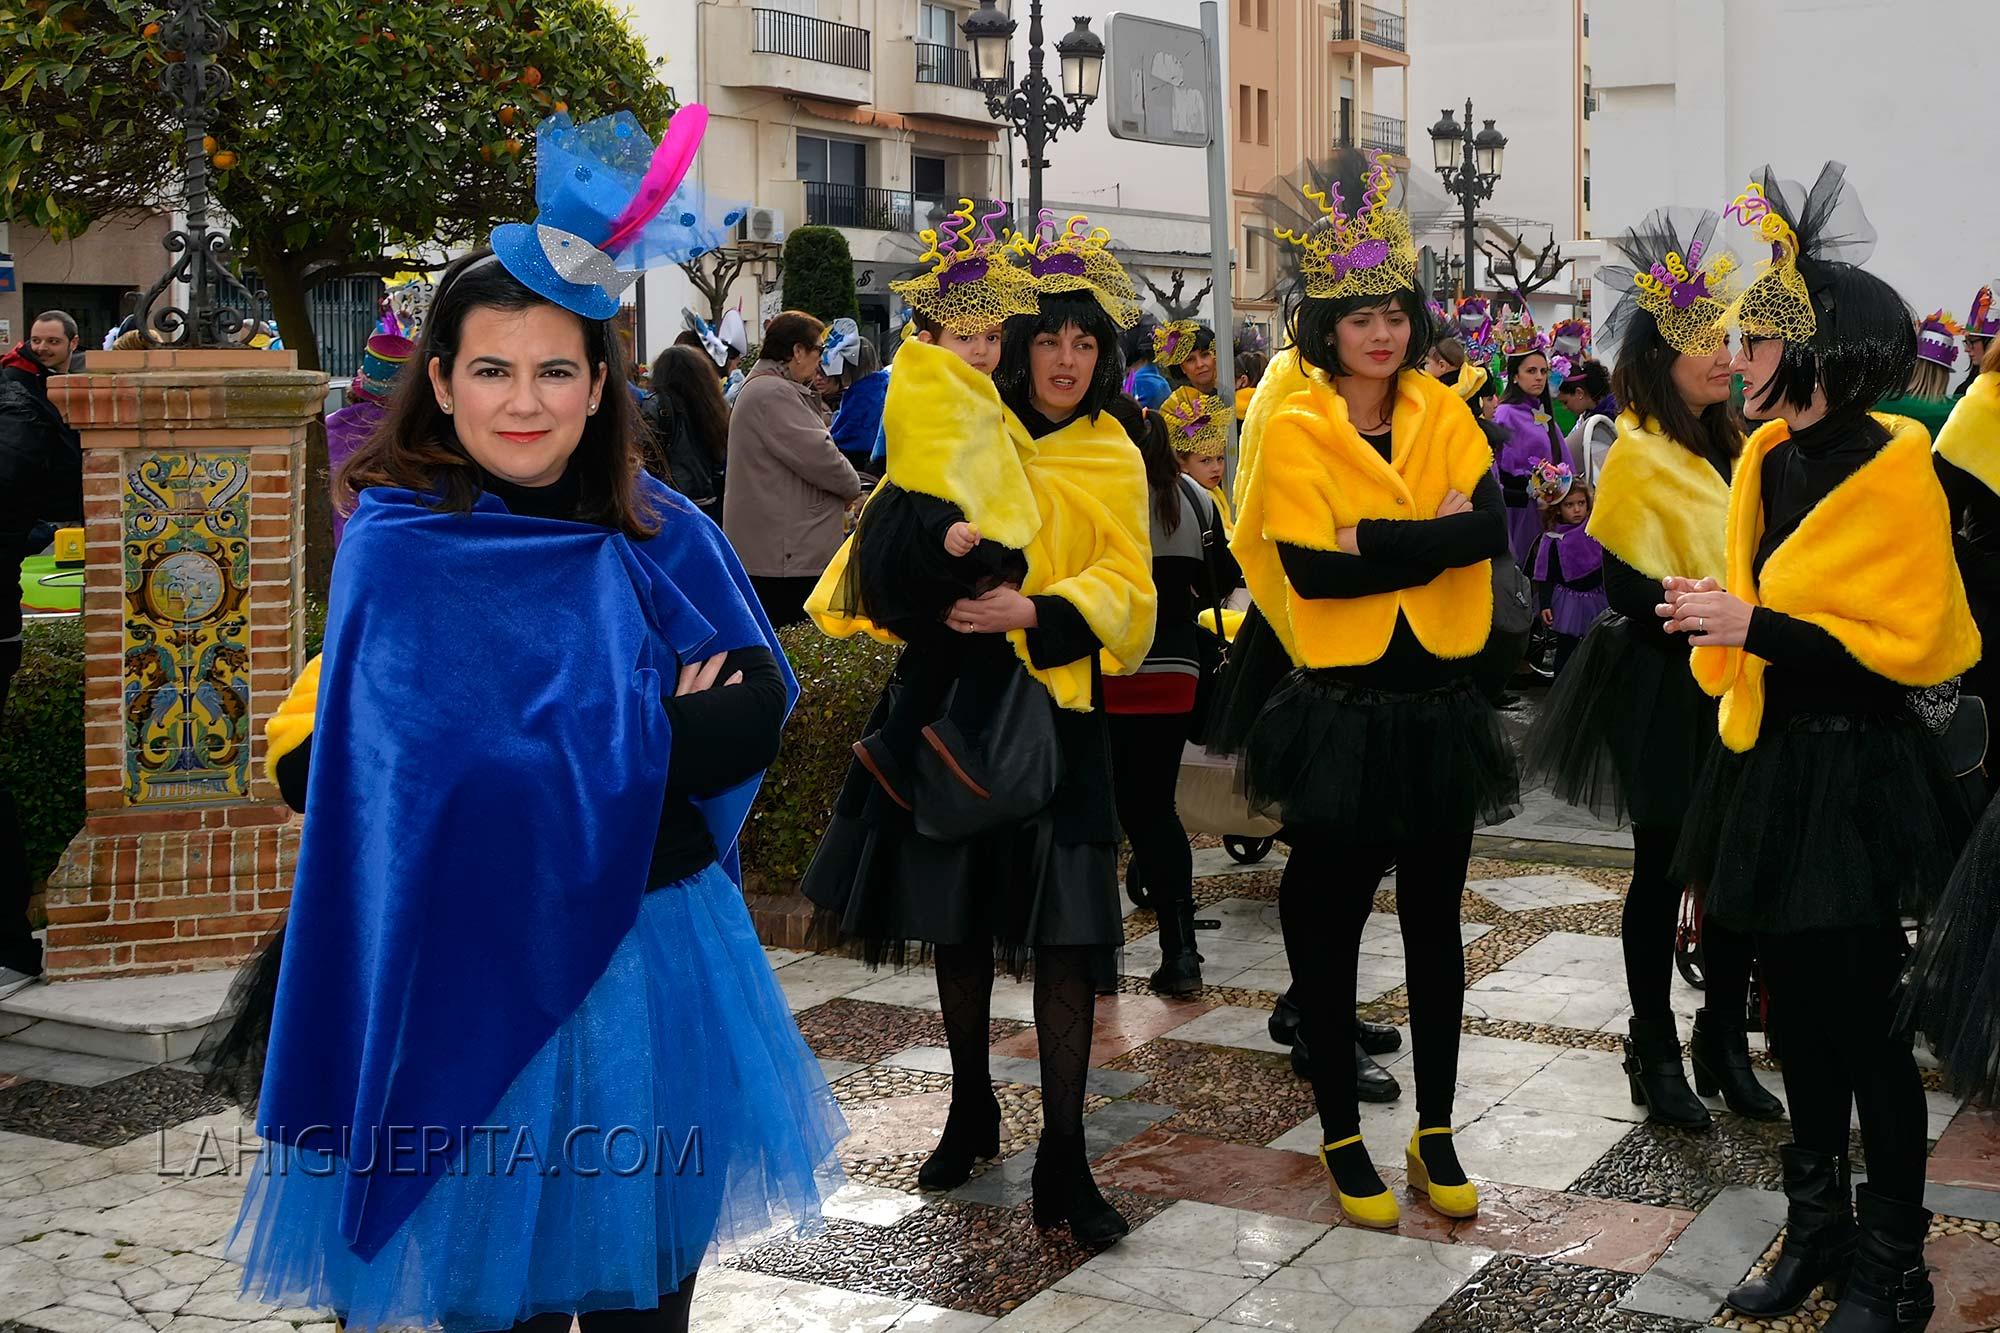 Cabalgata infantil de viudas carnaval de Isla cristina 2016 _DSC1825